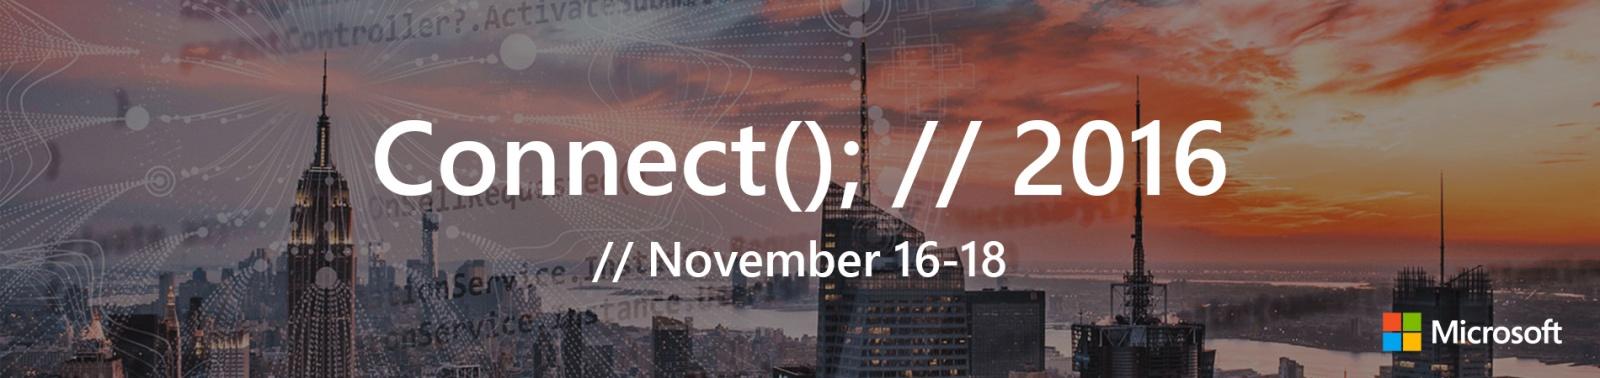 Connect(); -- 2016: Текстовая трансляция - 1